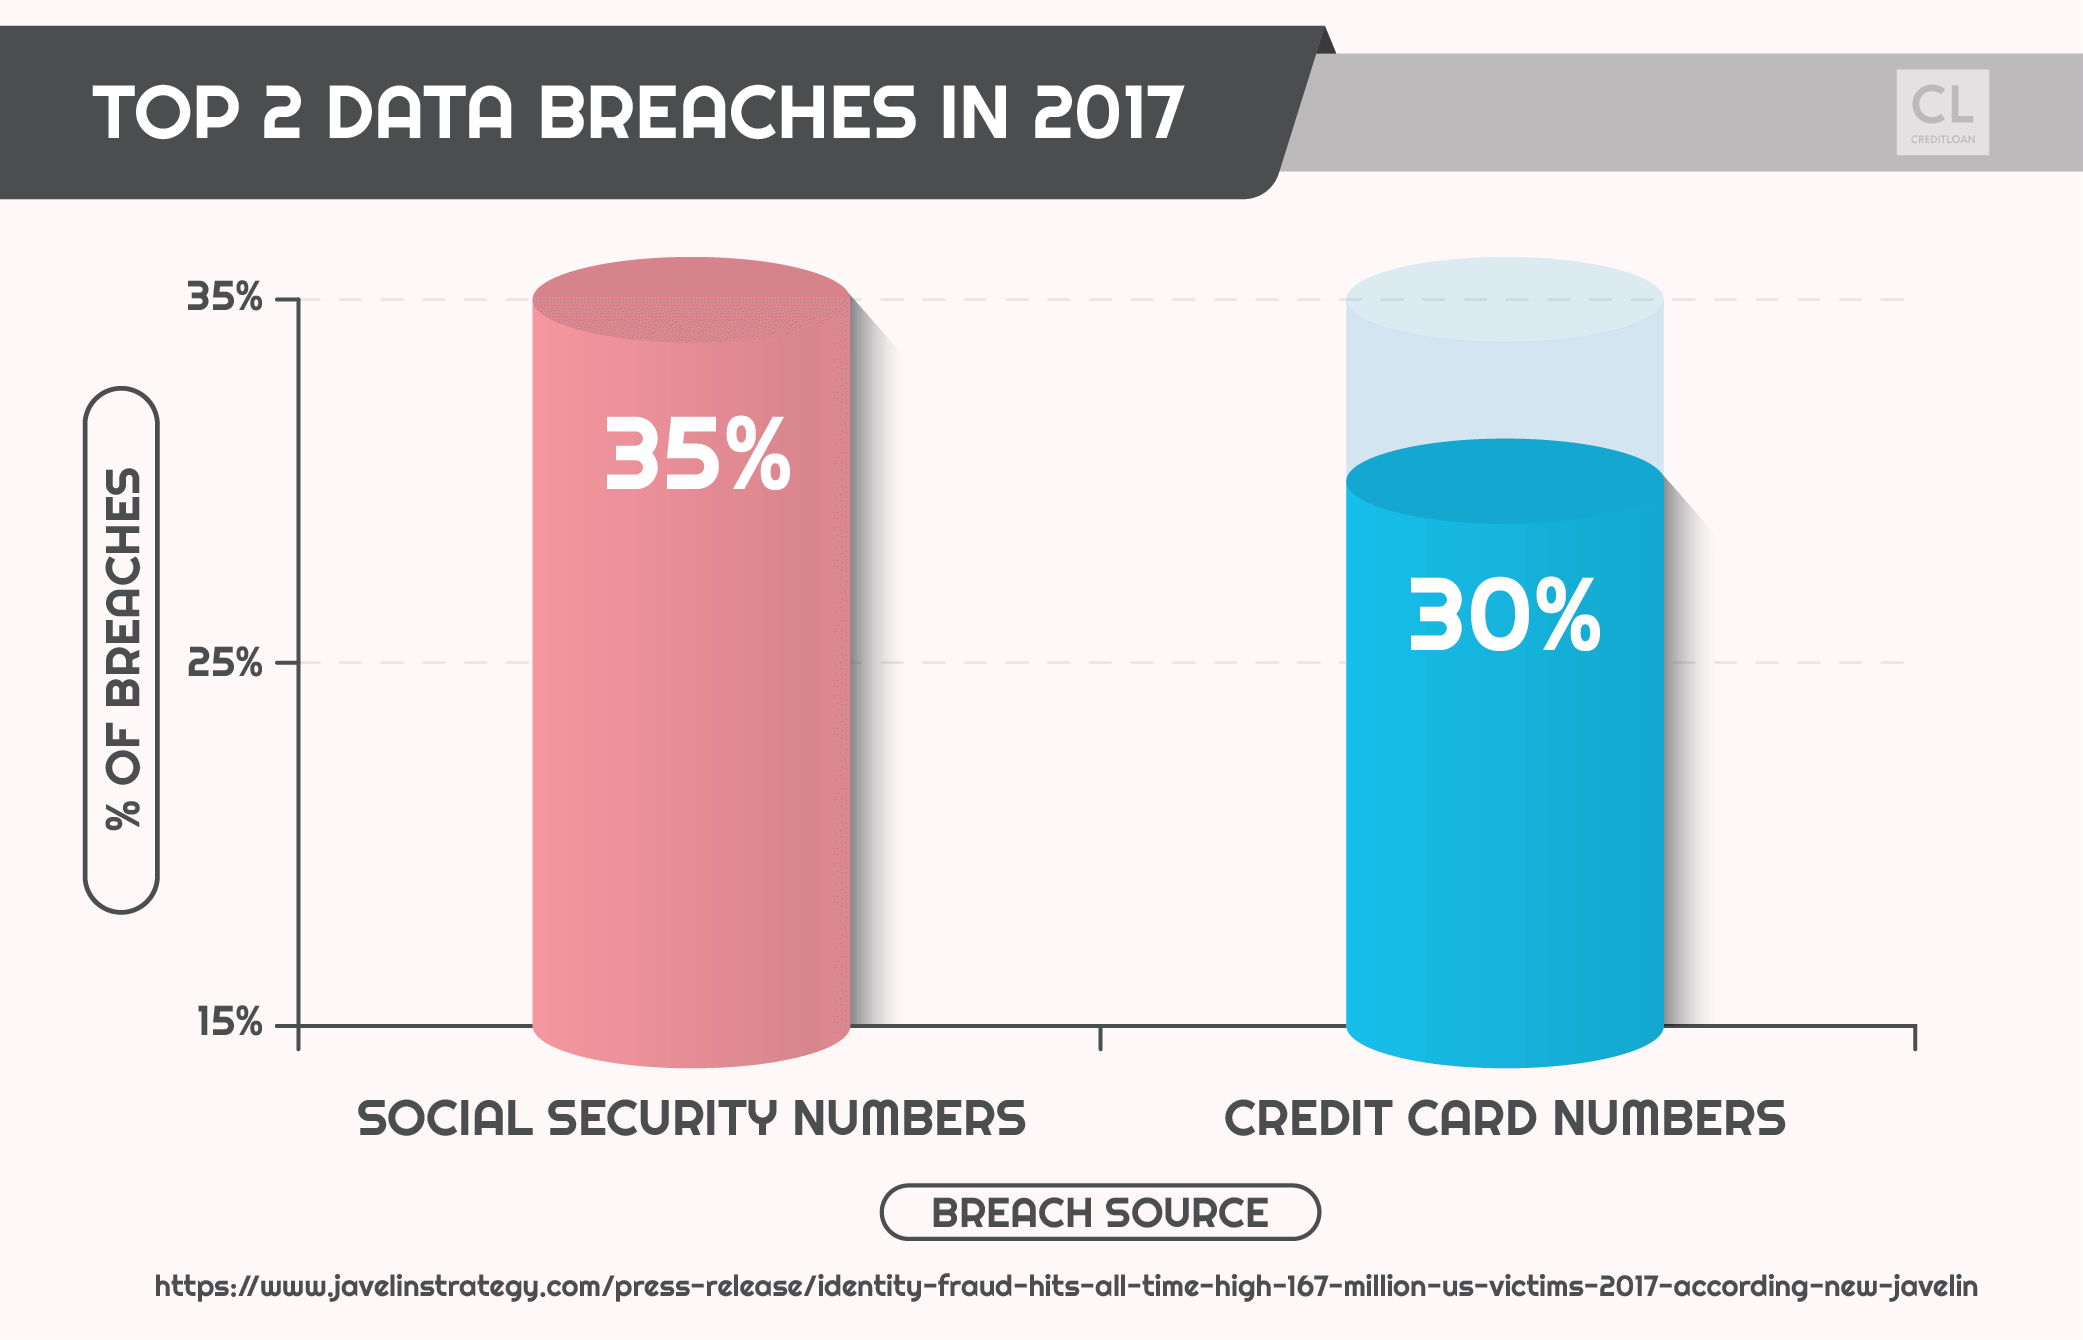 Top 2 Data Breaches in 2017